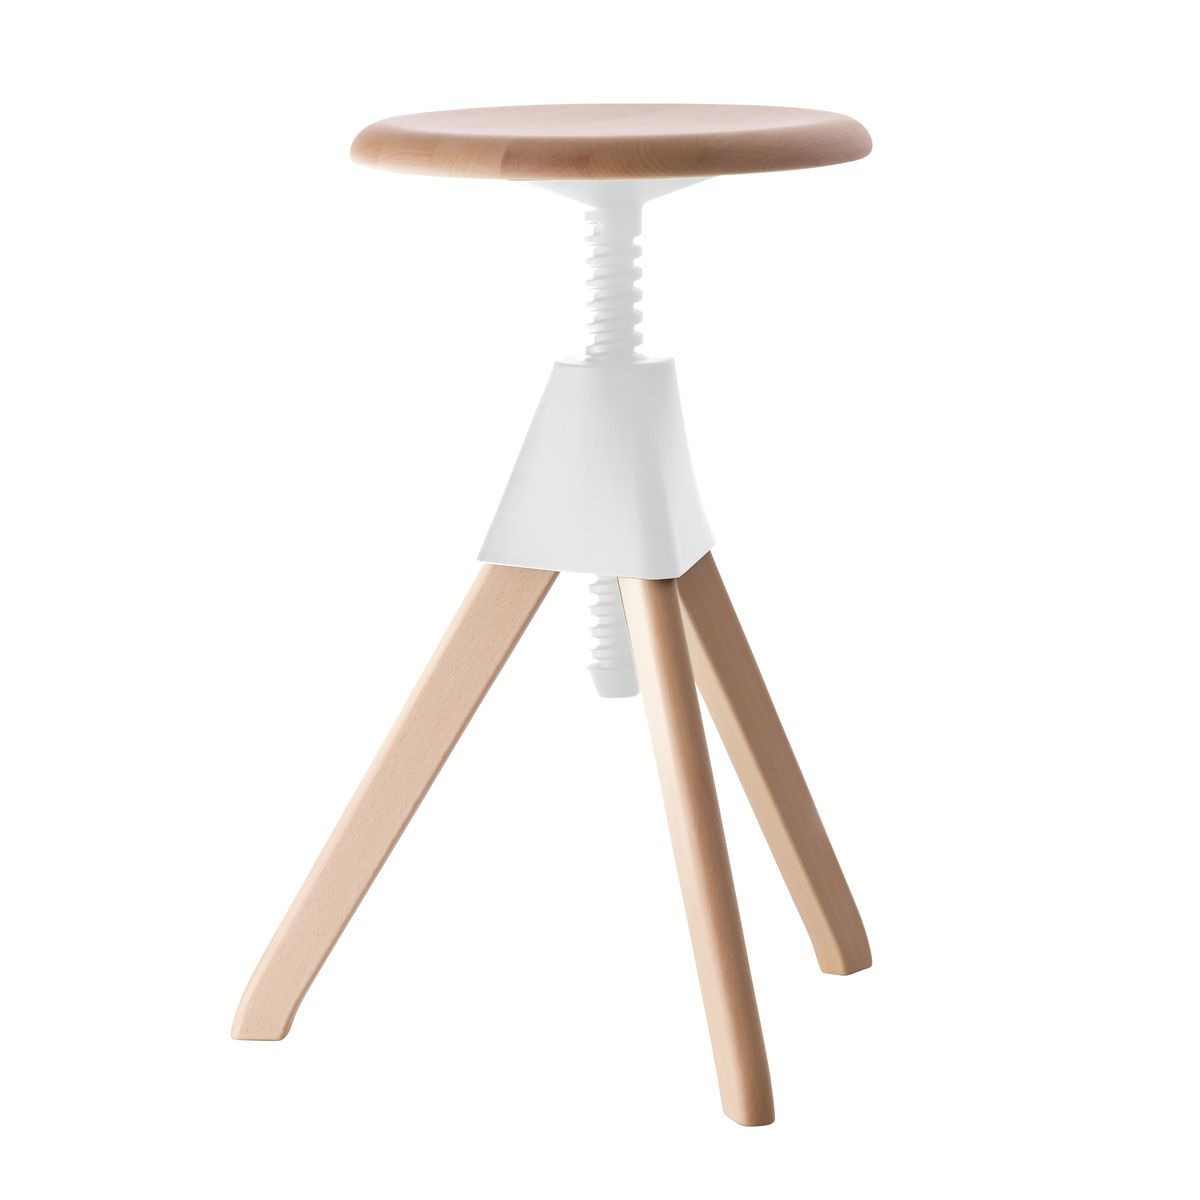 Jerry stool 50 66ccm magis for Magis stuhl